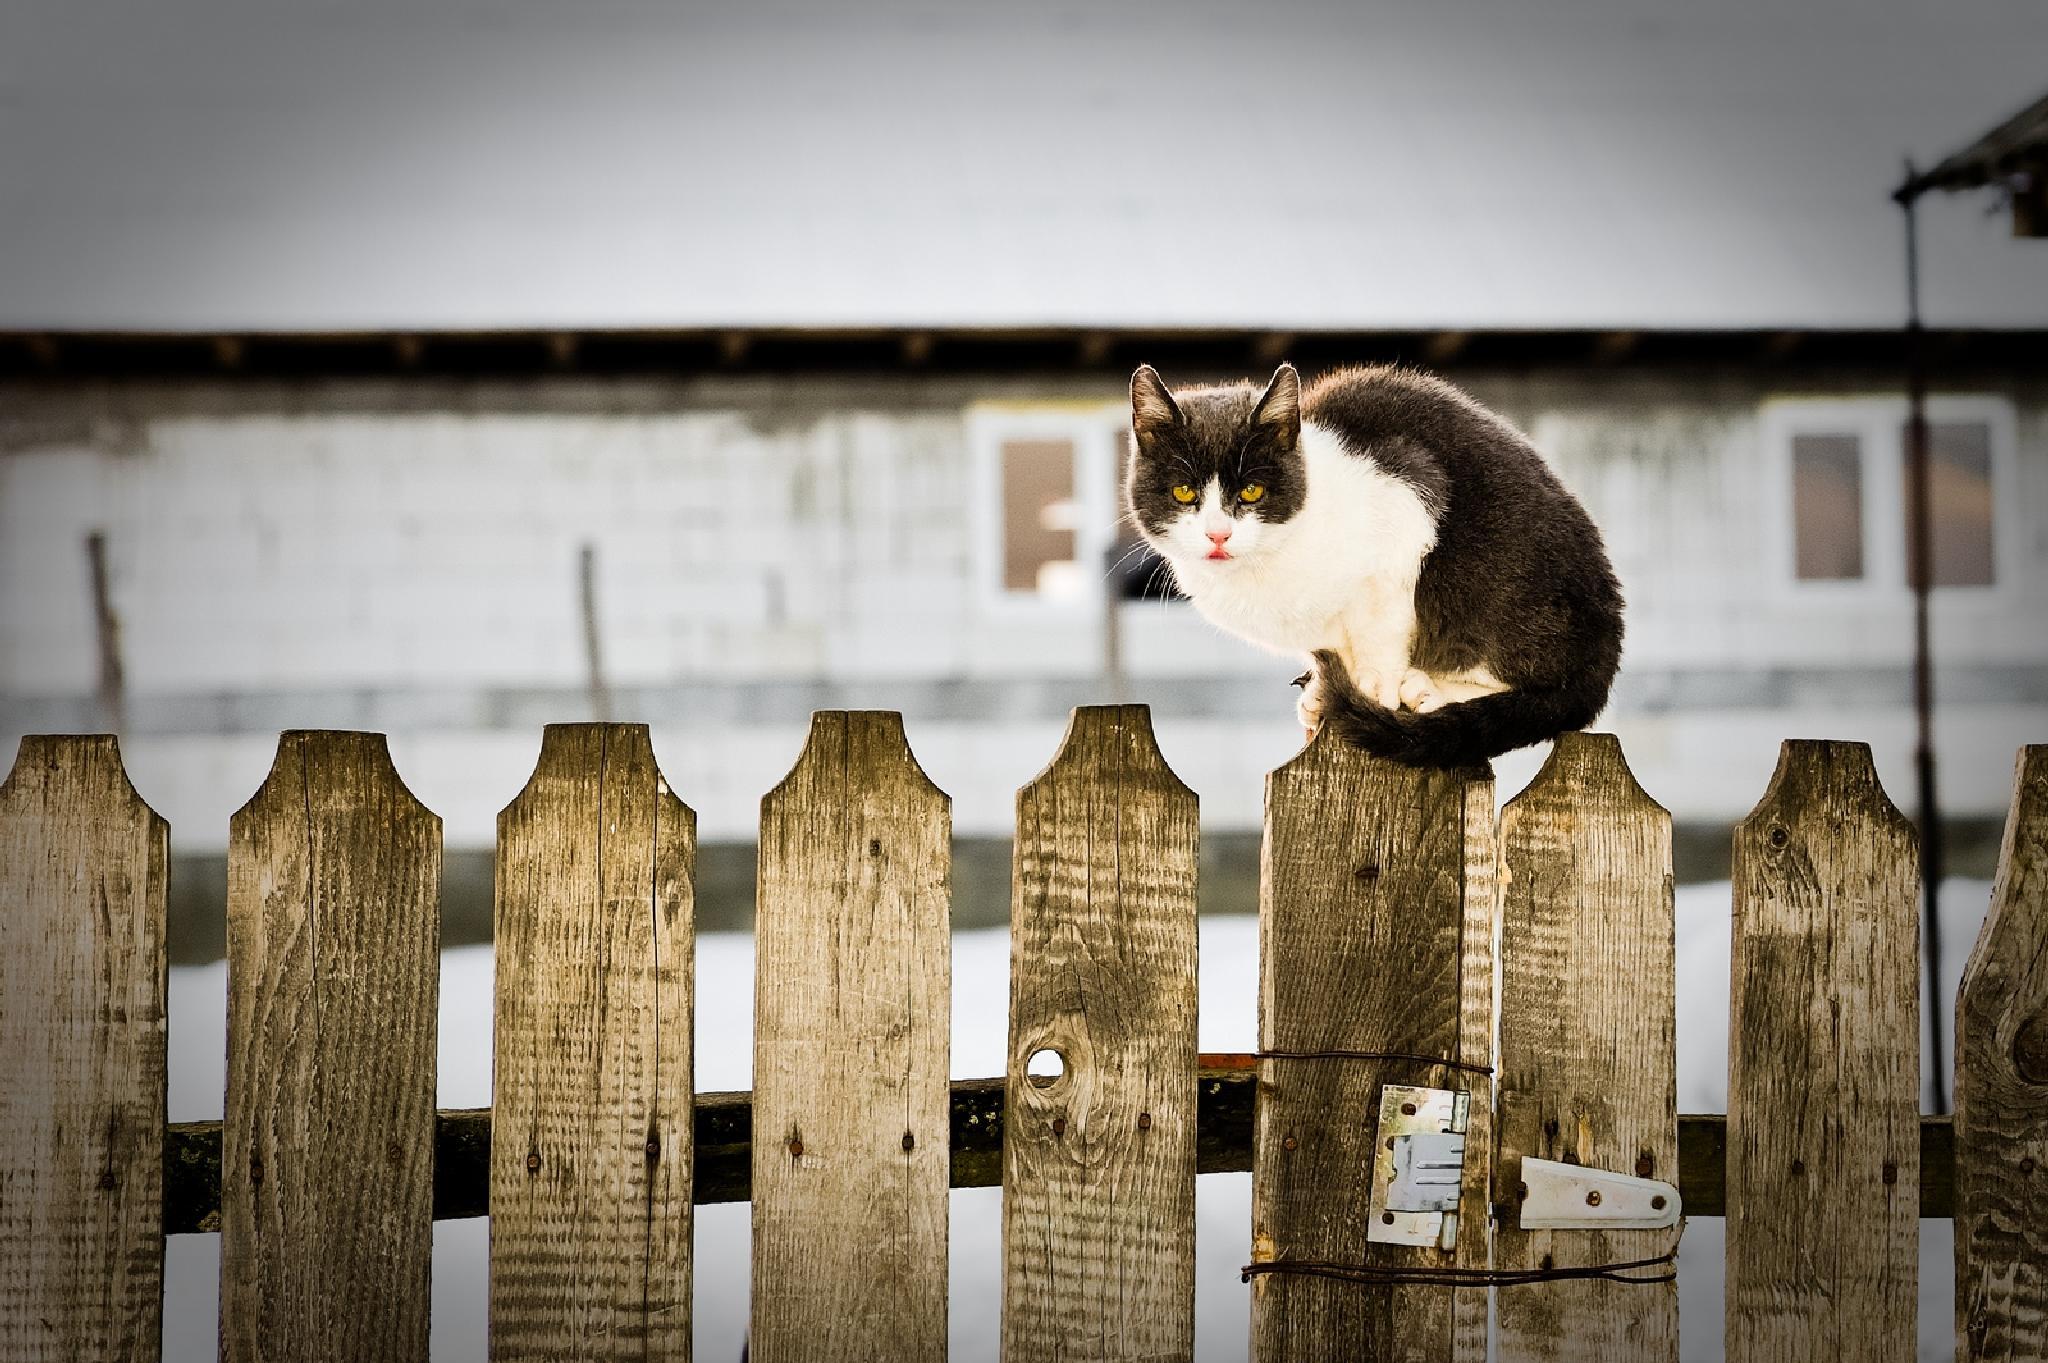 I'm watching you! by mihaipiscureanu